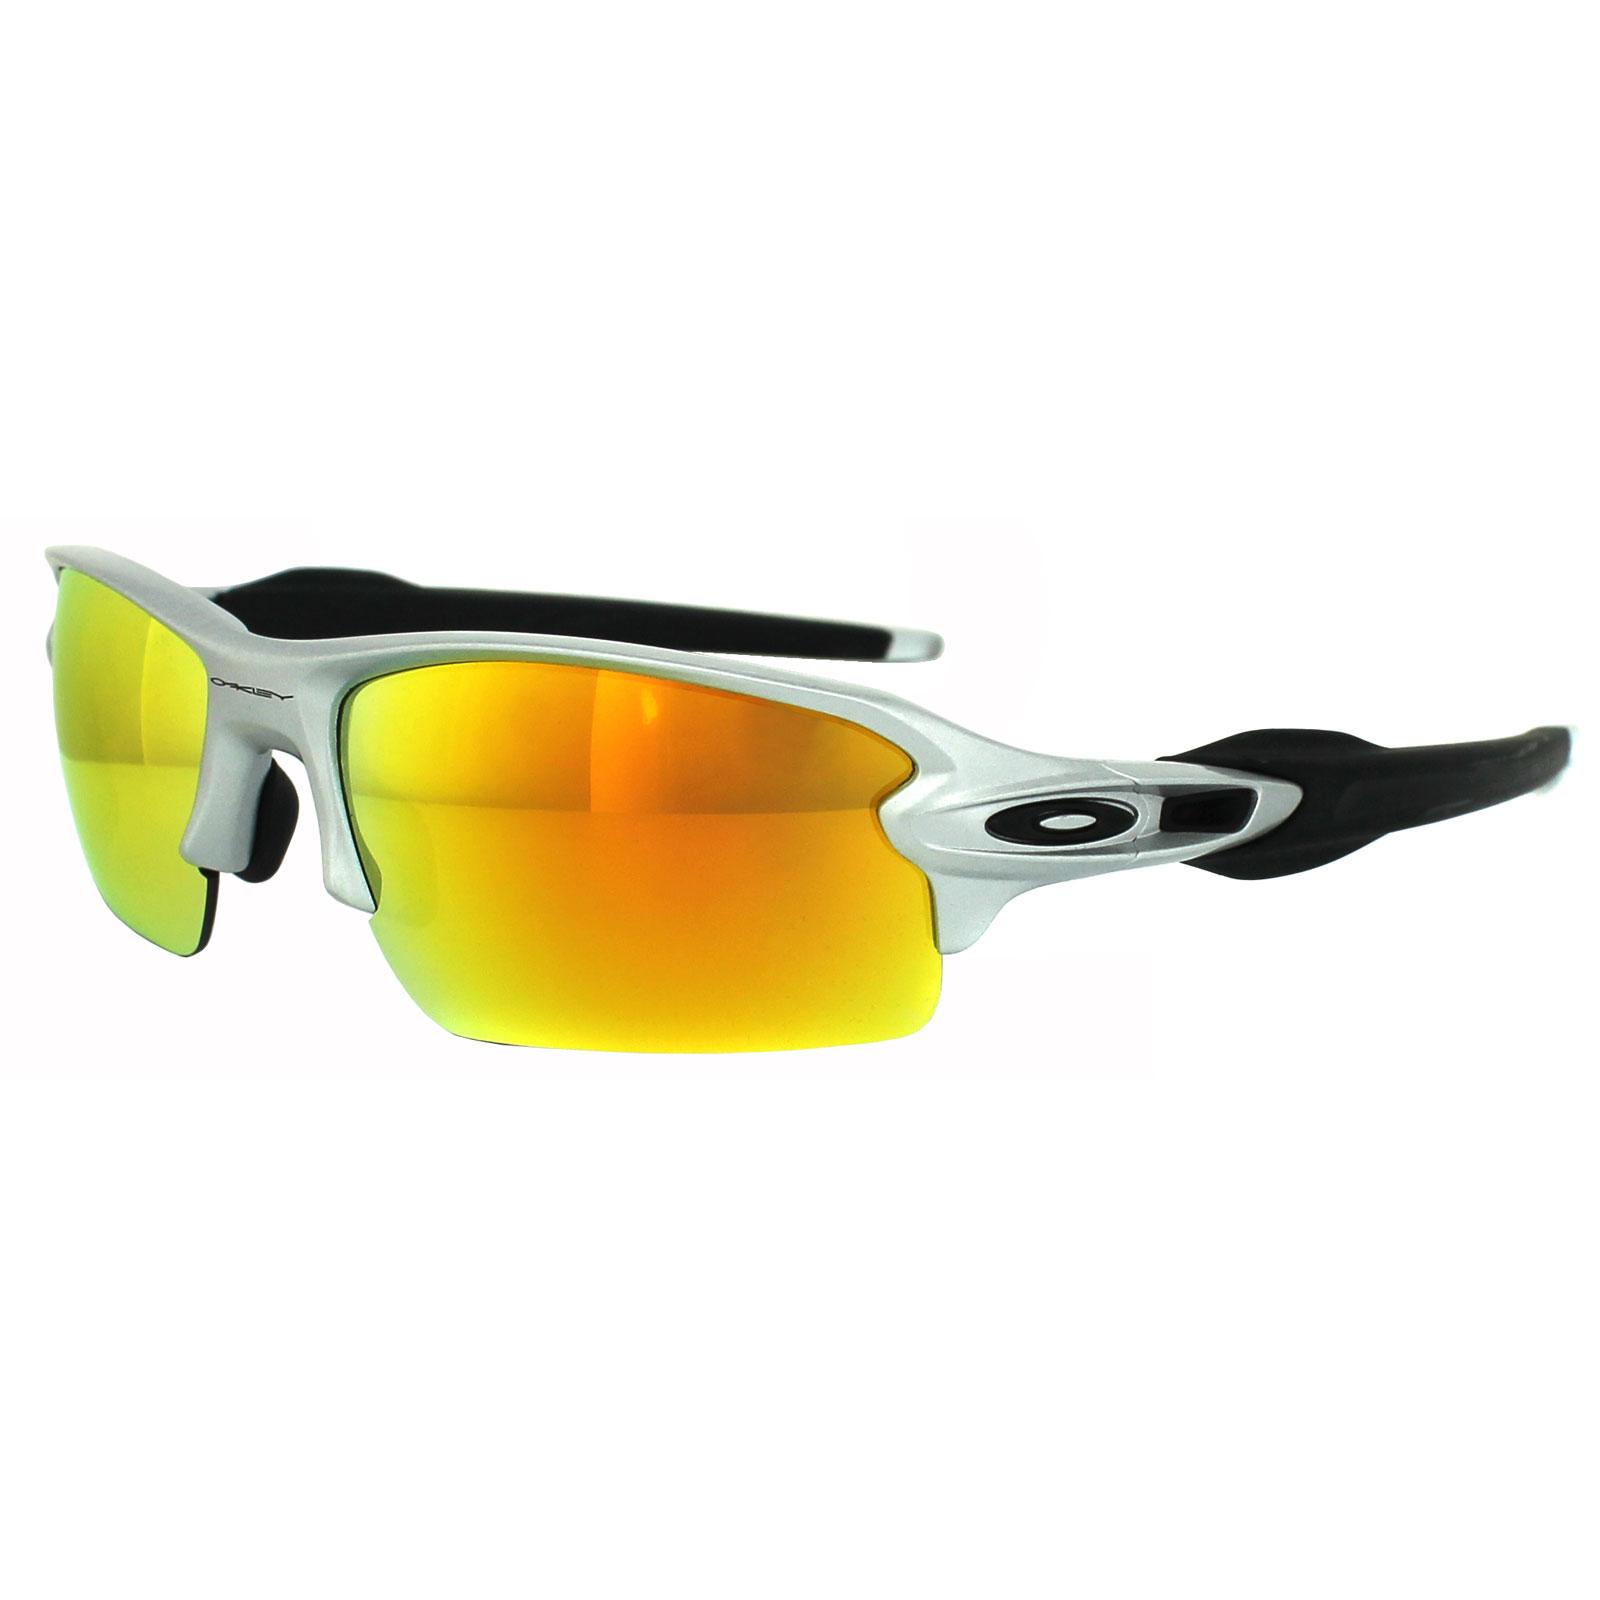 435c96d9e8c Sentinel Oakley Sunglasses Flak 2.0 OO9295-02 Silver Fire Iridium